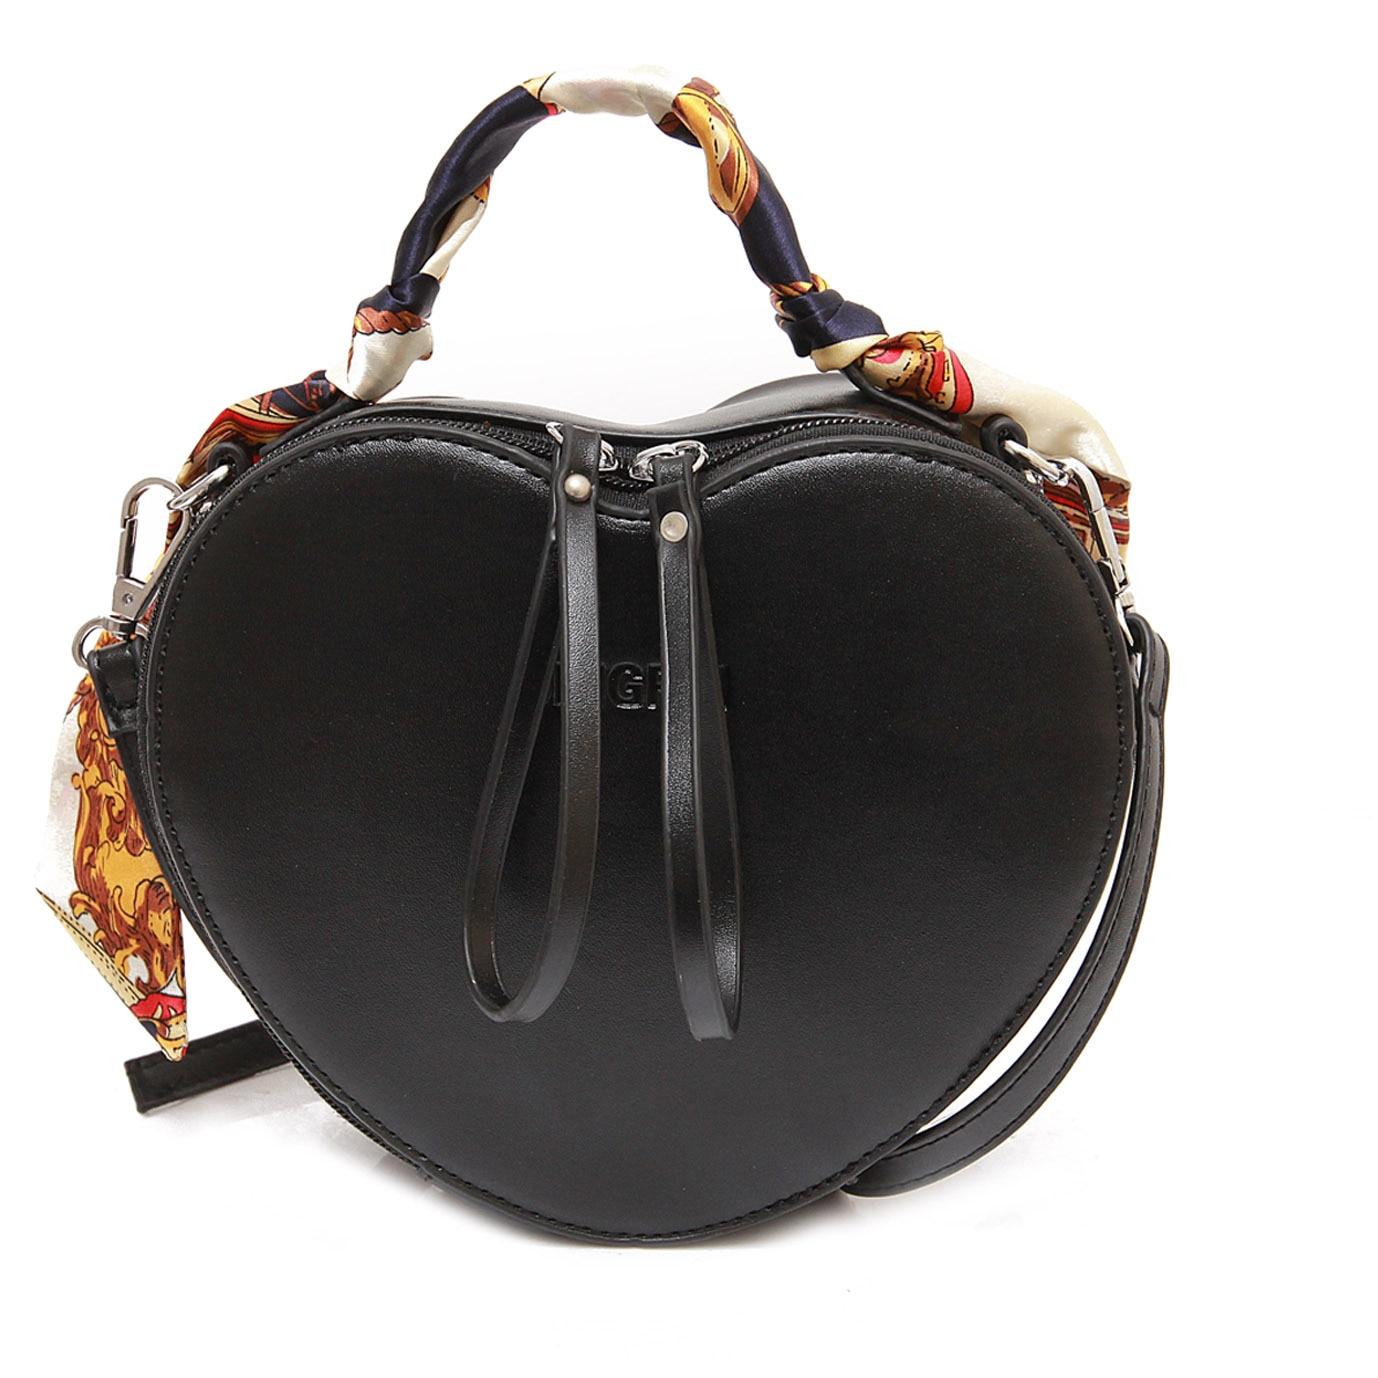 2017 new cartoon red heart shape women shoulder crossbody messenger bag scarves decoration lady lovely peach handbag